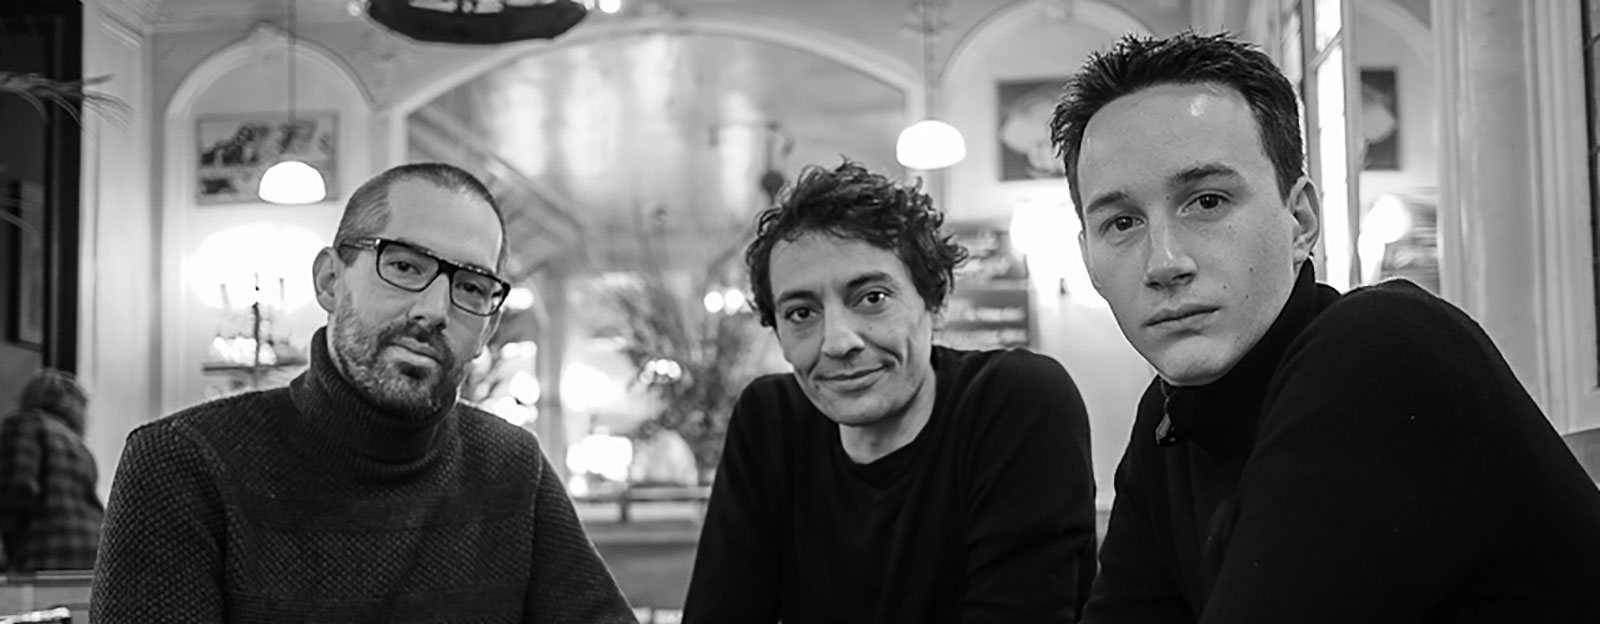 SWITCH TRIO – IN TOWN – 12/12/20 # Duc des Lombards, Paris